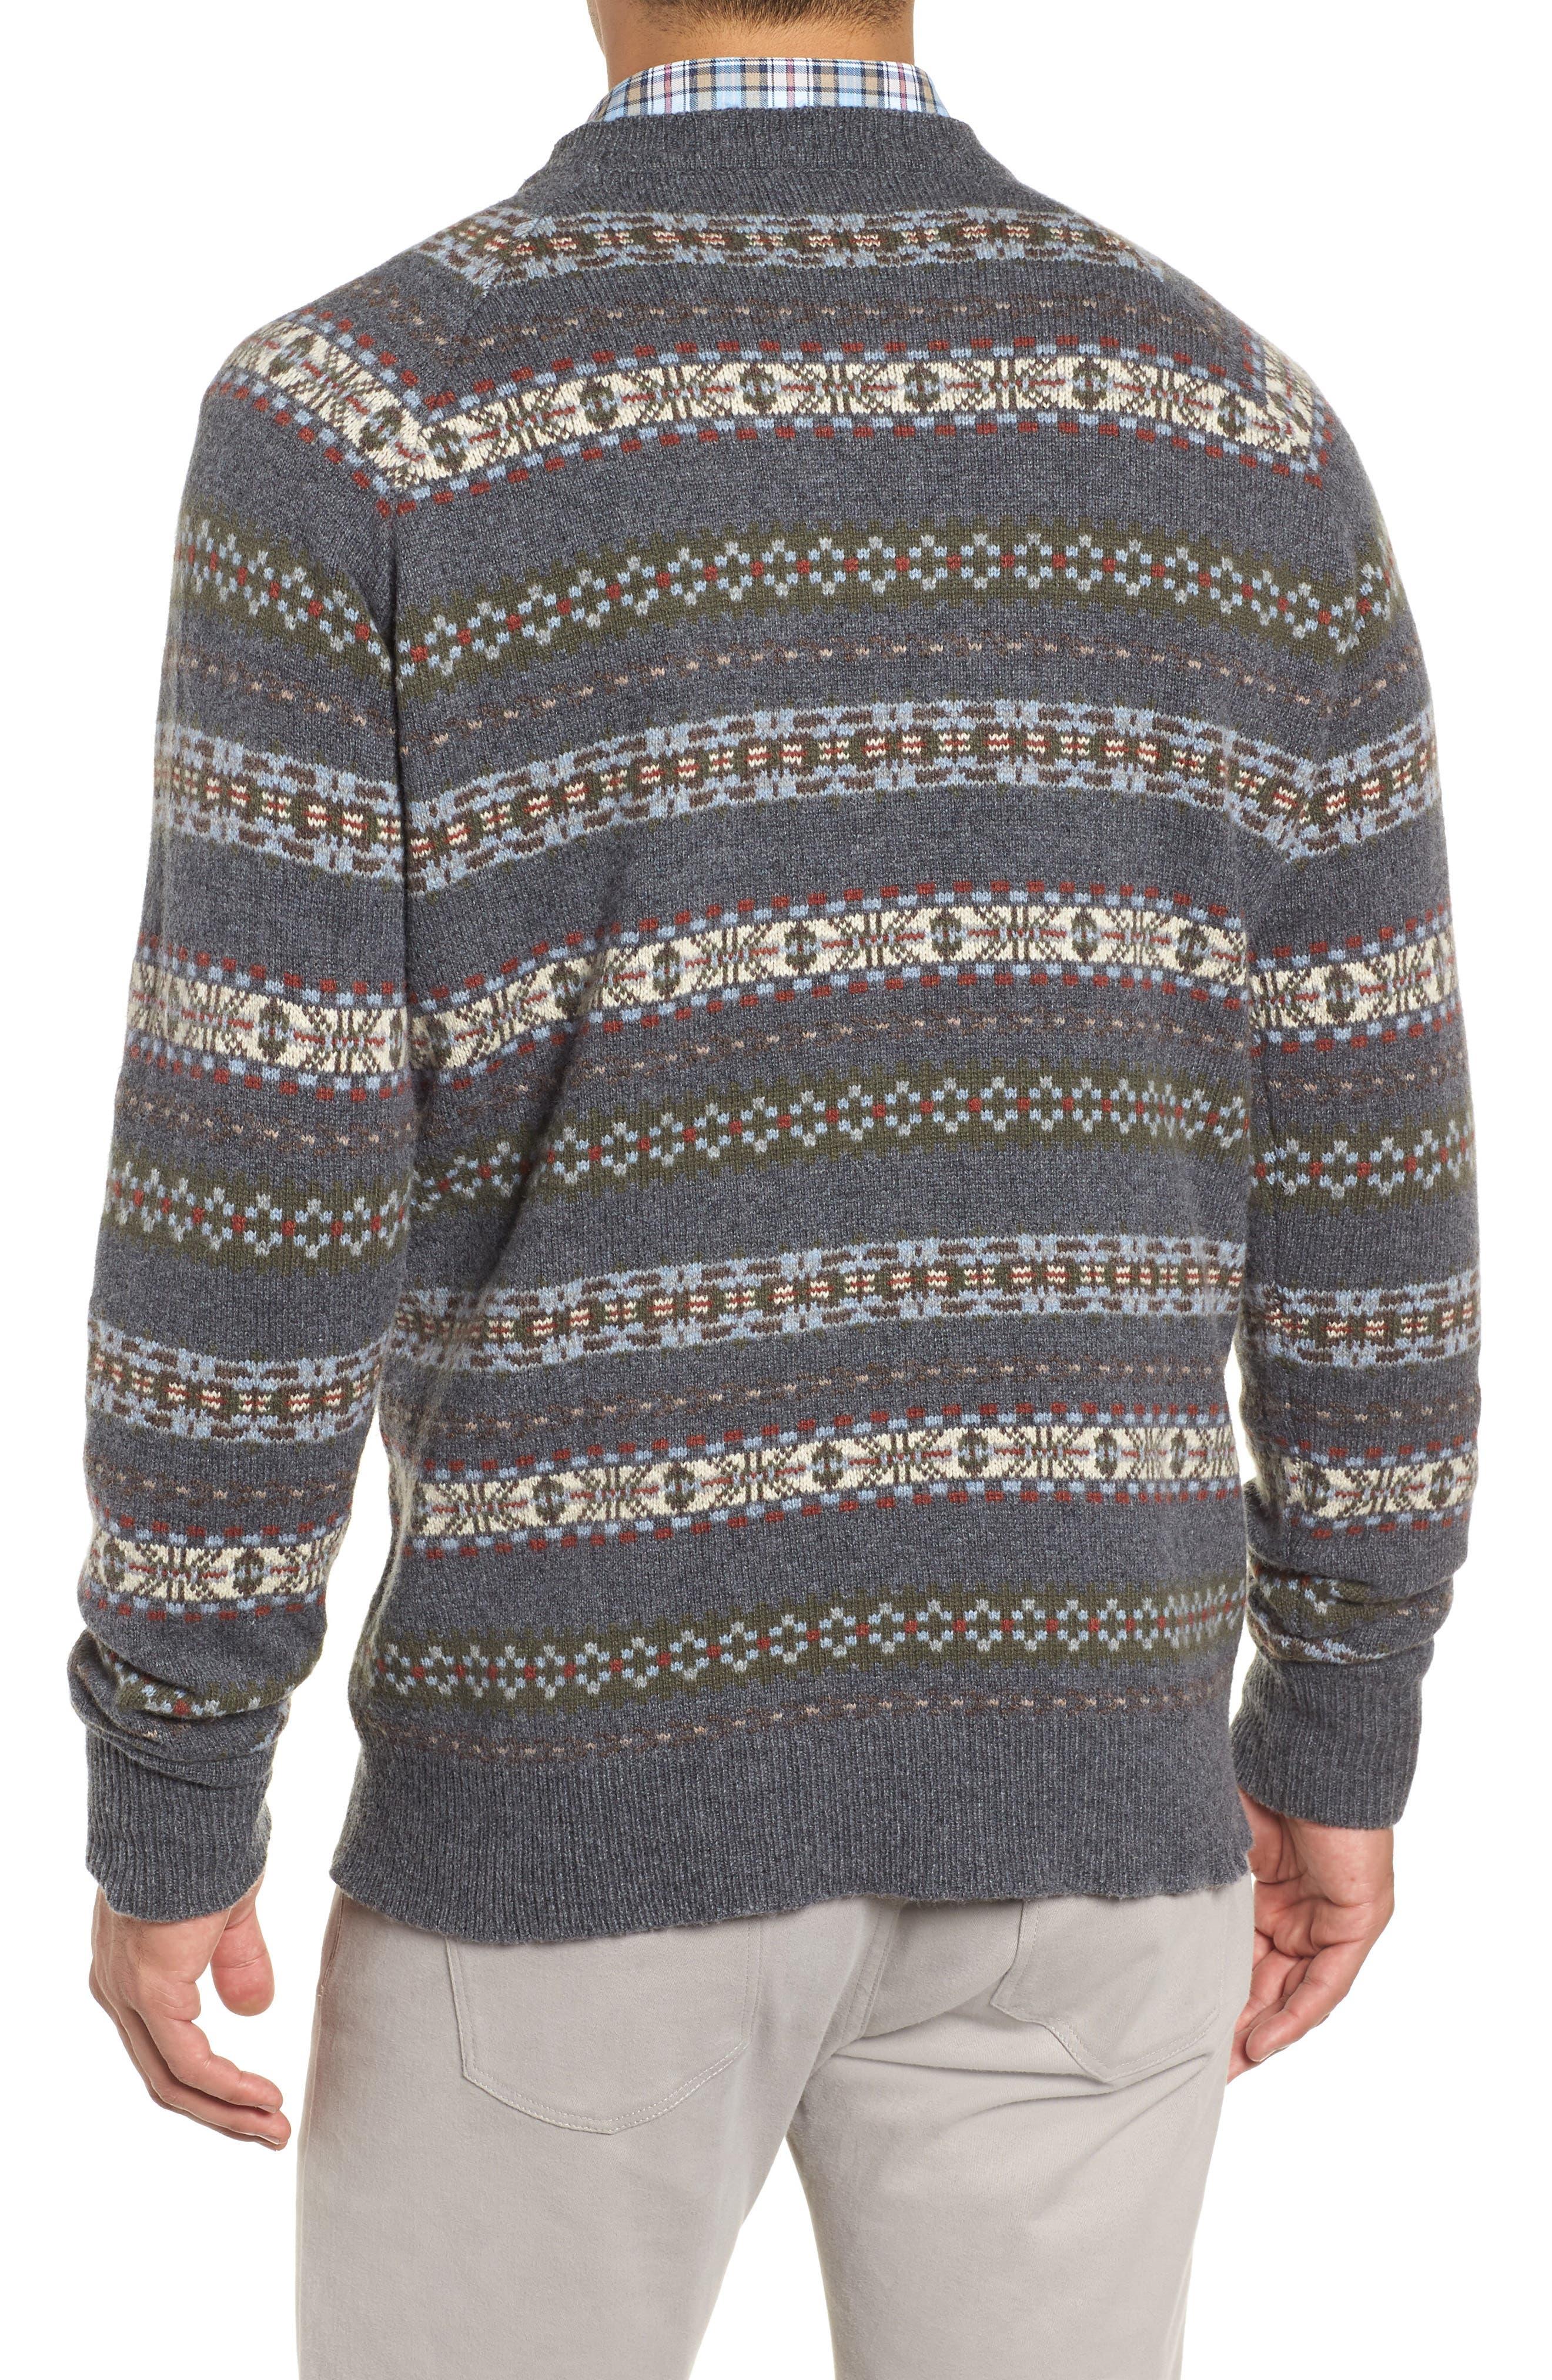 Mountainside Fair Isle Crewneck Sweater,                             Alternate thumbnail 2, color,                             Black